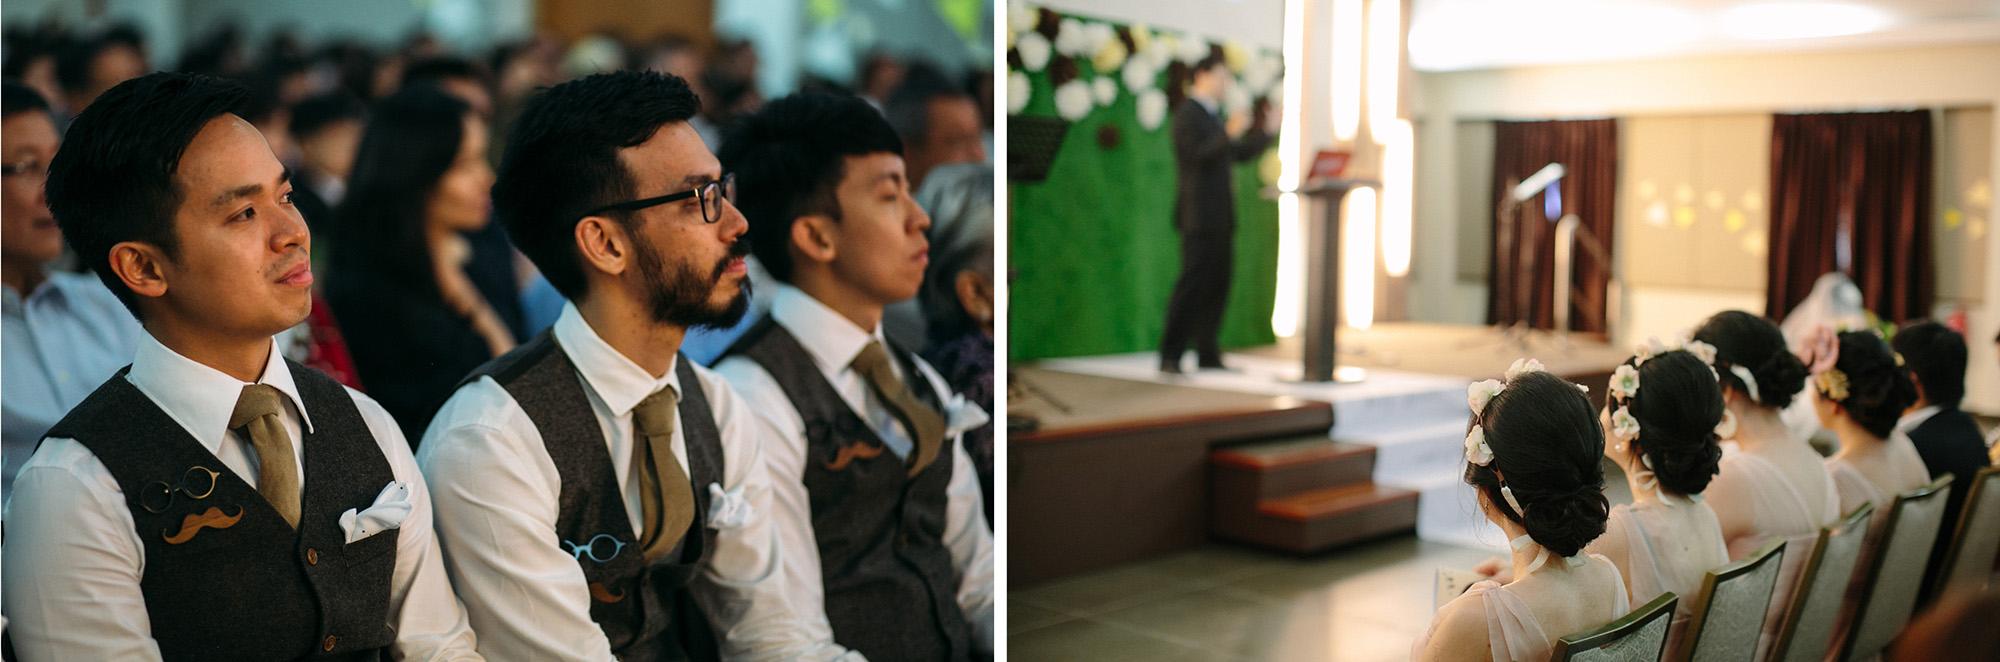 113-hellojanelee-sam grace-malaysia-wedding-day